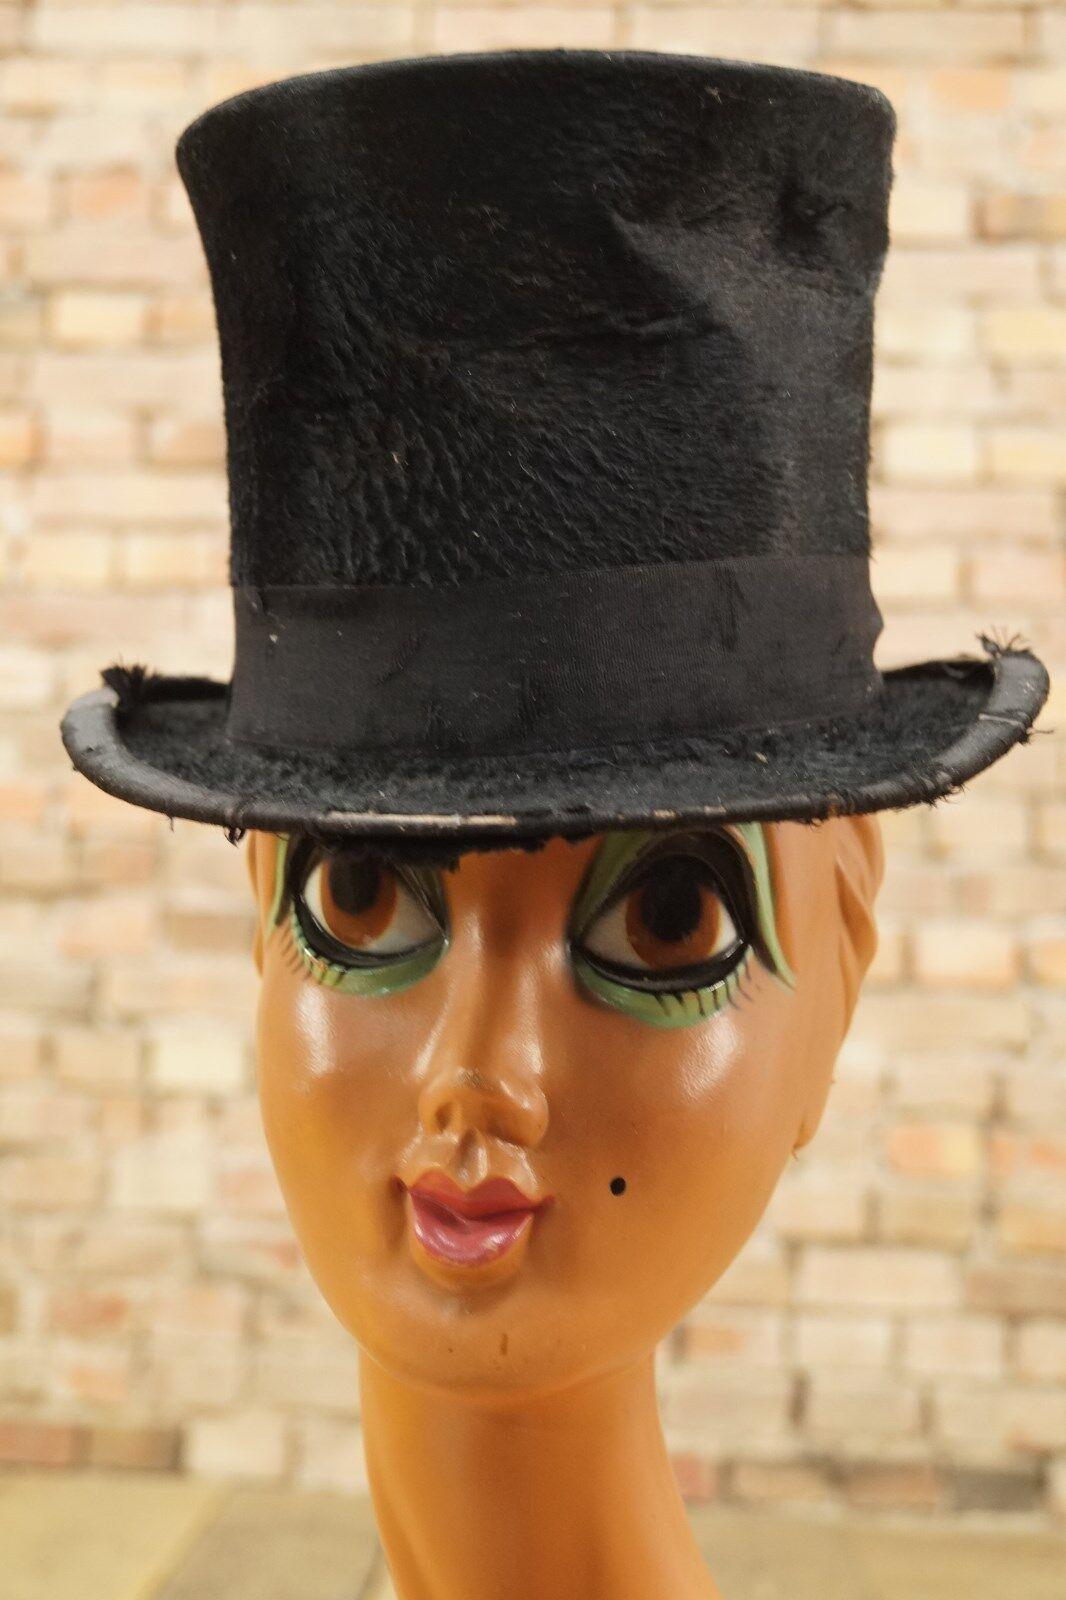 Antiguo Herrn Sombrero Cilindro Vintage Claque Negro Hat Shabby Tramp-Look